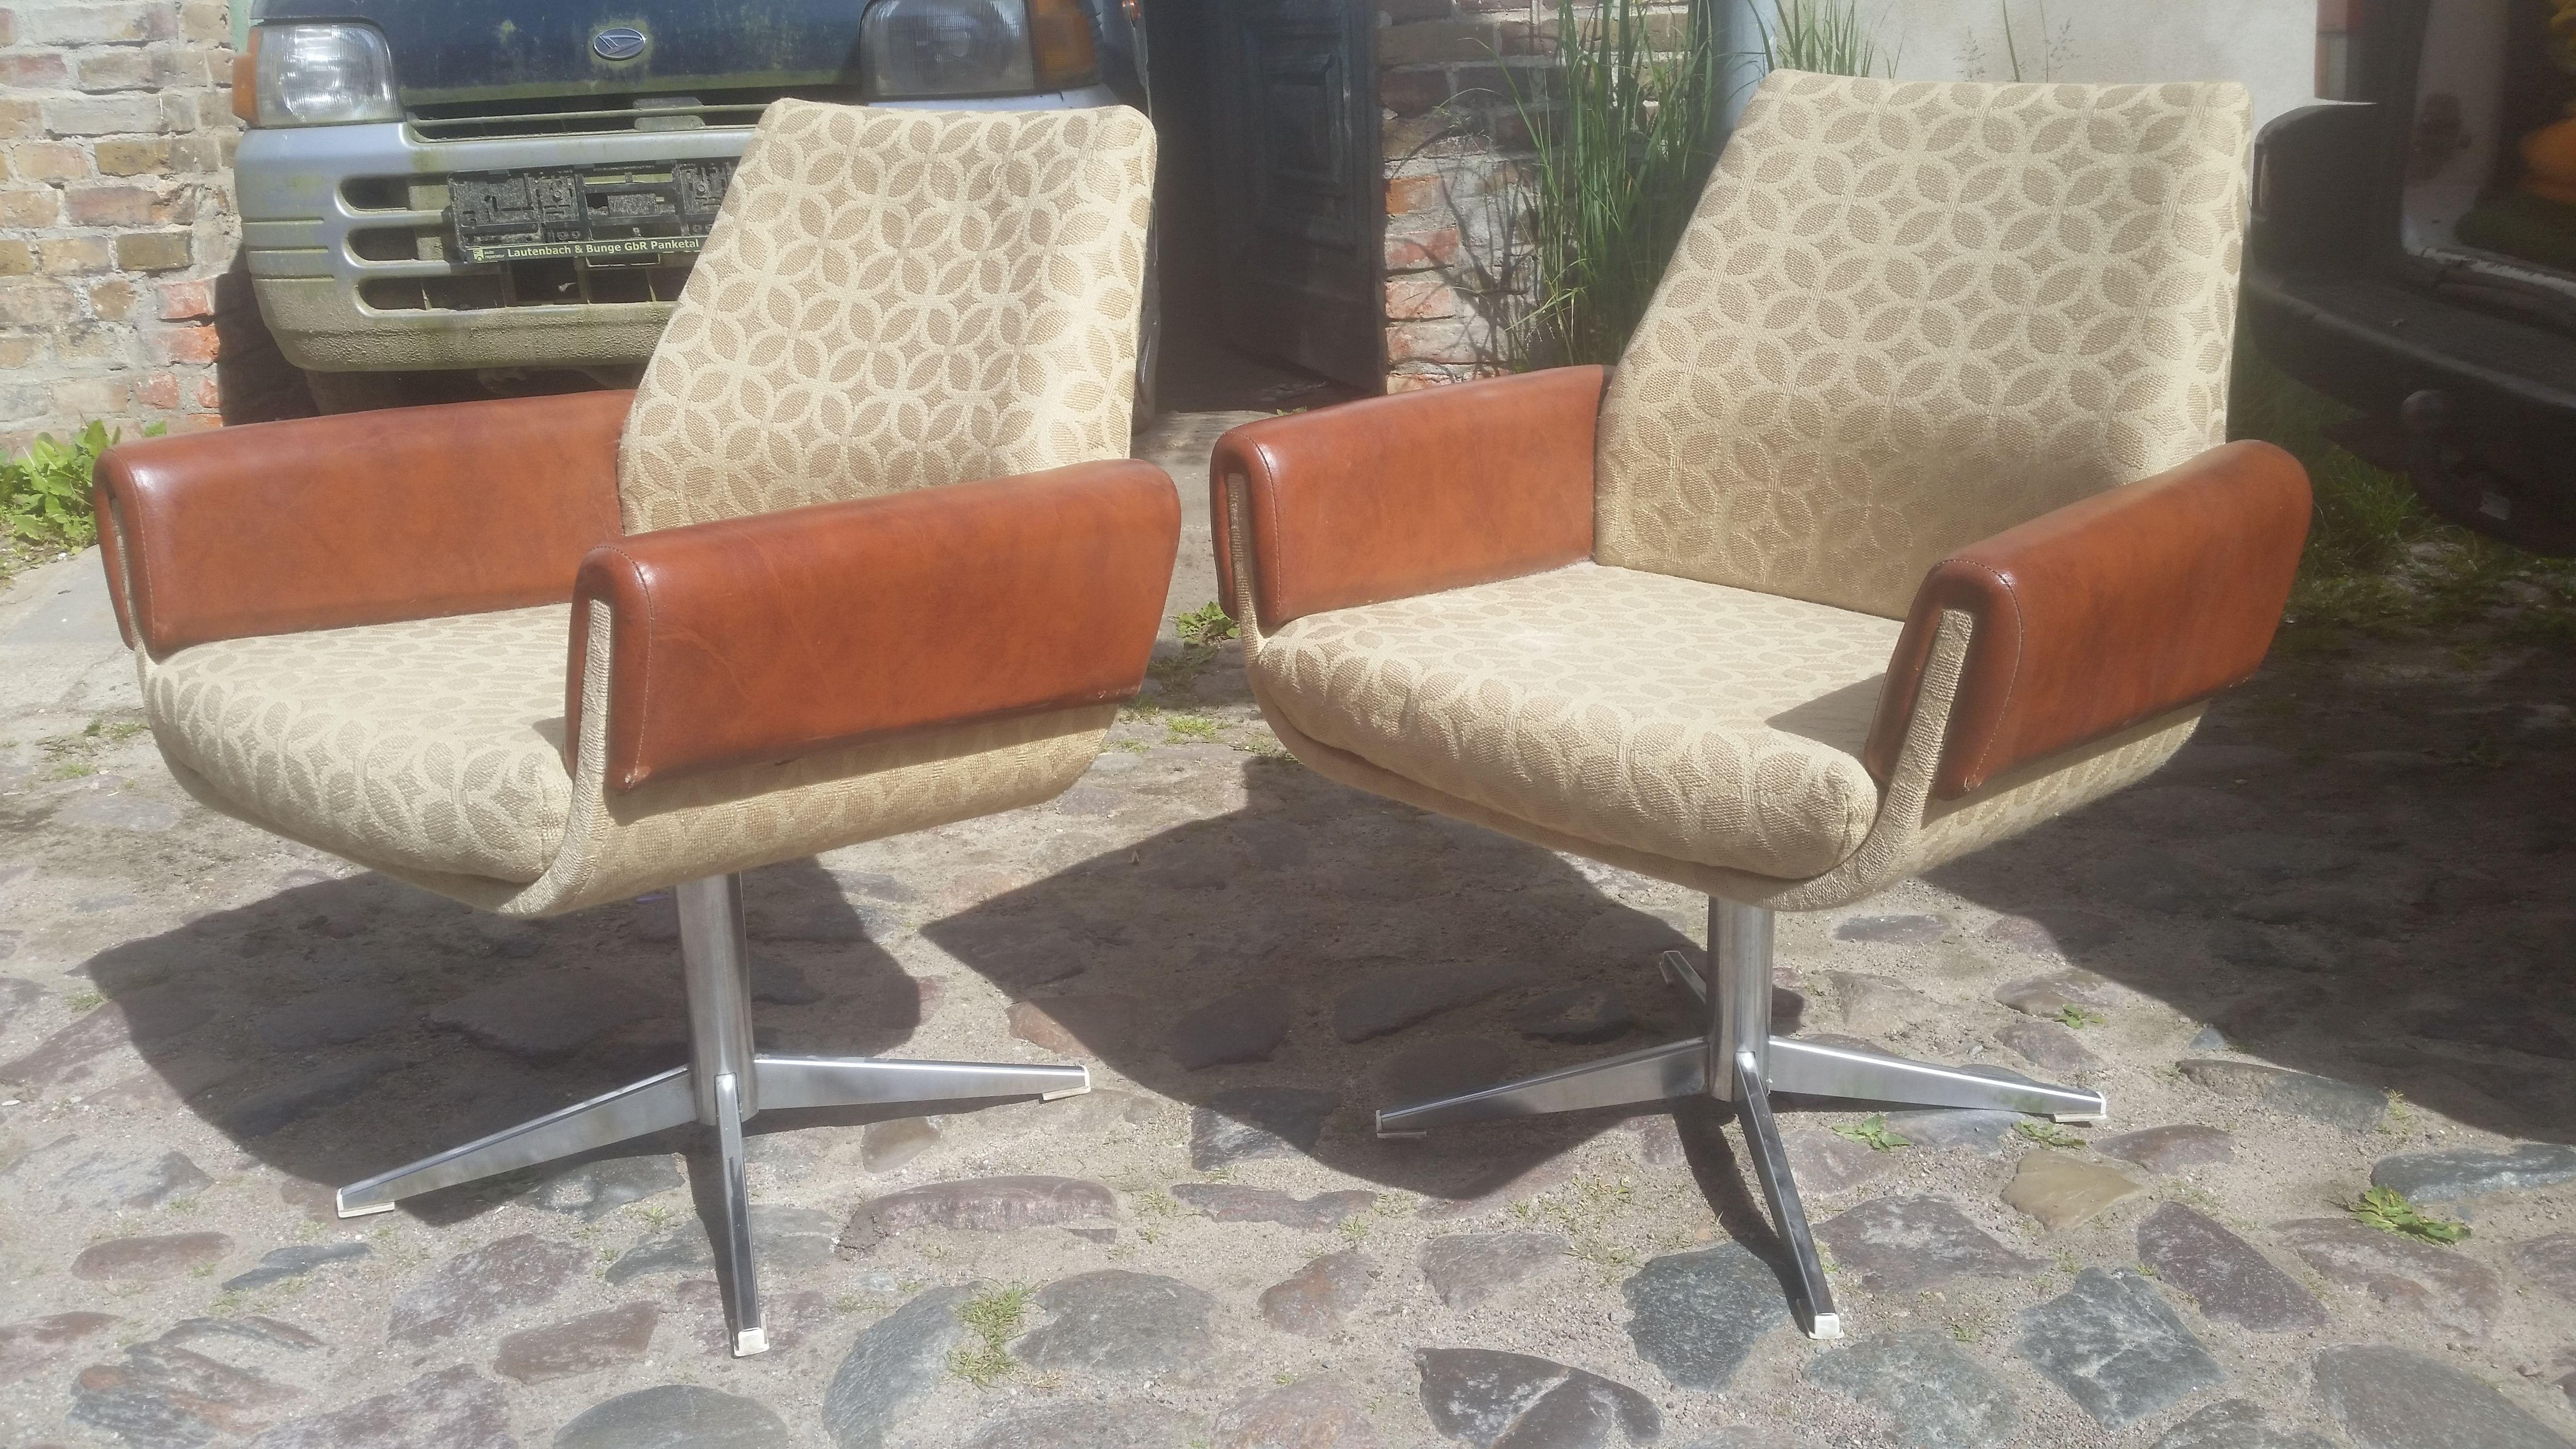 My Vintage Berlin Drehsessel Sessel Einrichtung